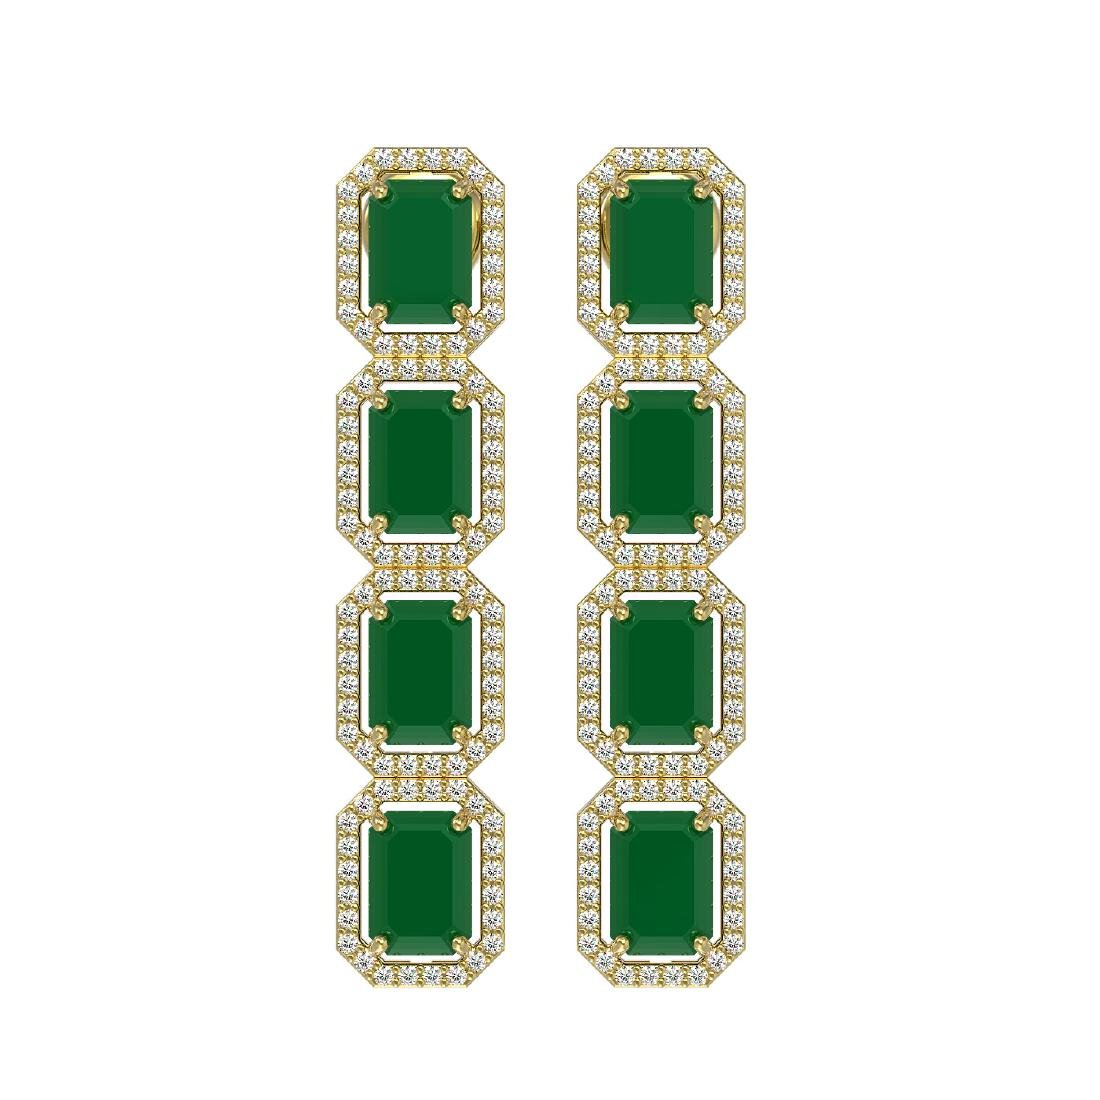 12.33 CTW Emerald & Diamond Halo Earrings 10K Yellow